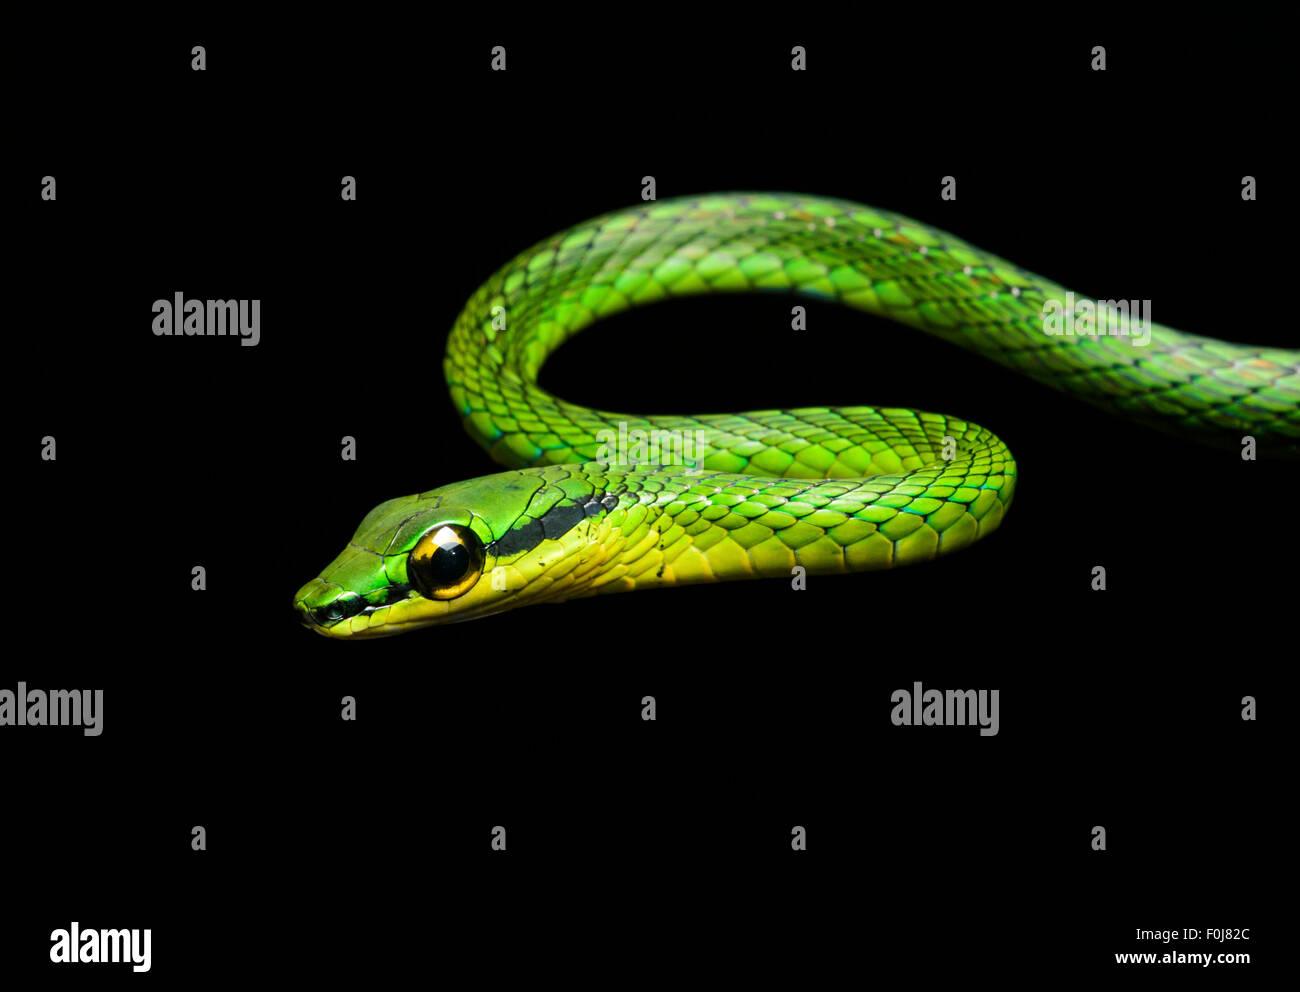 La viña de Cope snake (Oxybelis brevirostris), la serpiente (Colubridae), Chocó rainforest, Ecuador Foto de stock